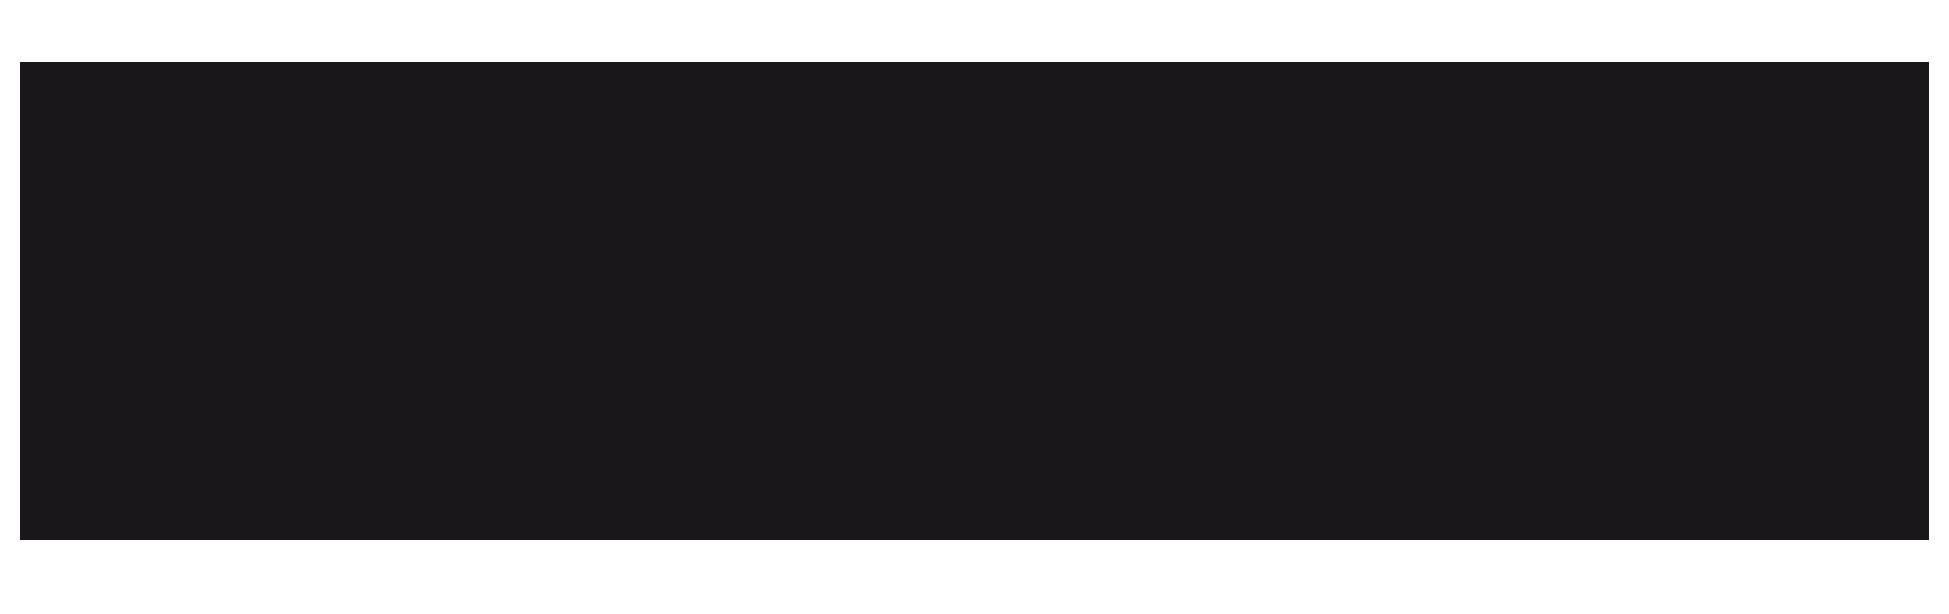 ISDI: xISDI LearningTracks Voice Technology